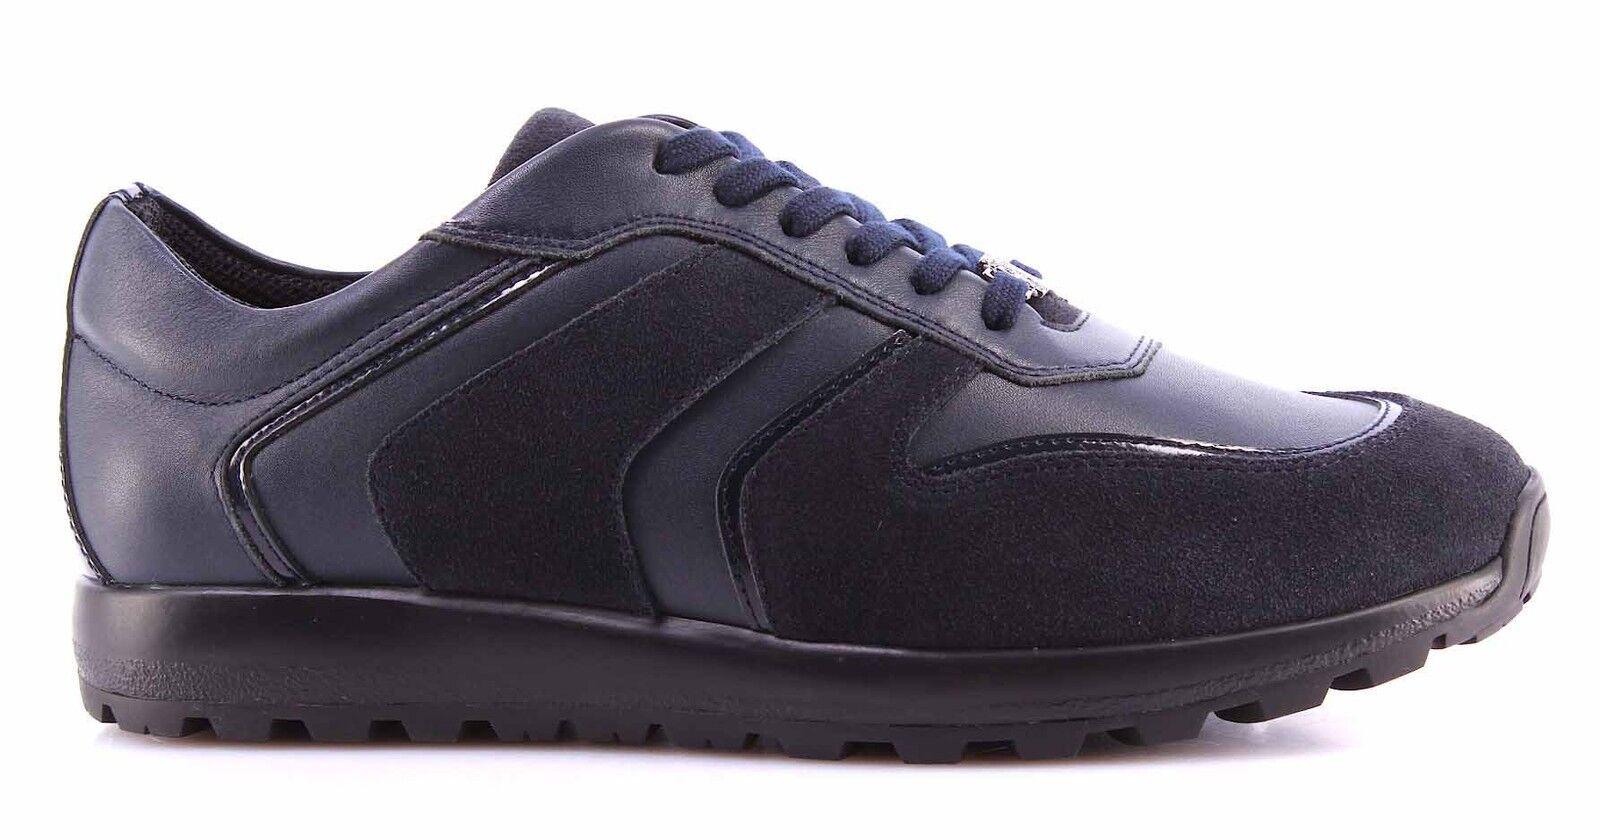 Herren V400C Sneakers Schuhe VERSACE COLLECTION V400C Herren Leder Blau Made In  Neu New 22aaff